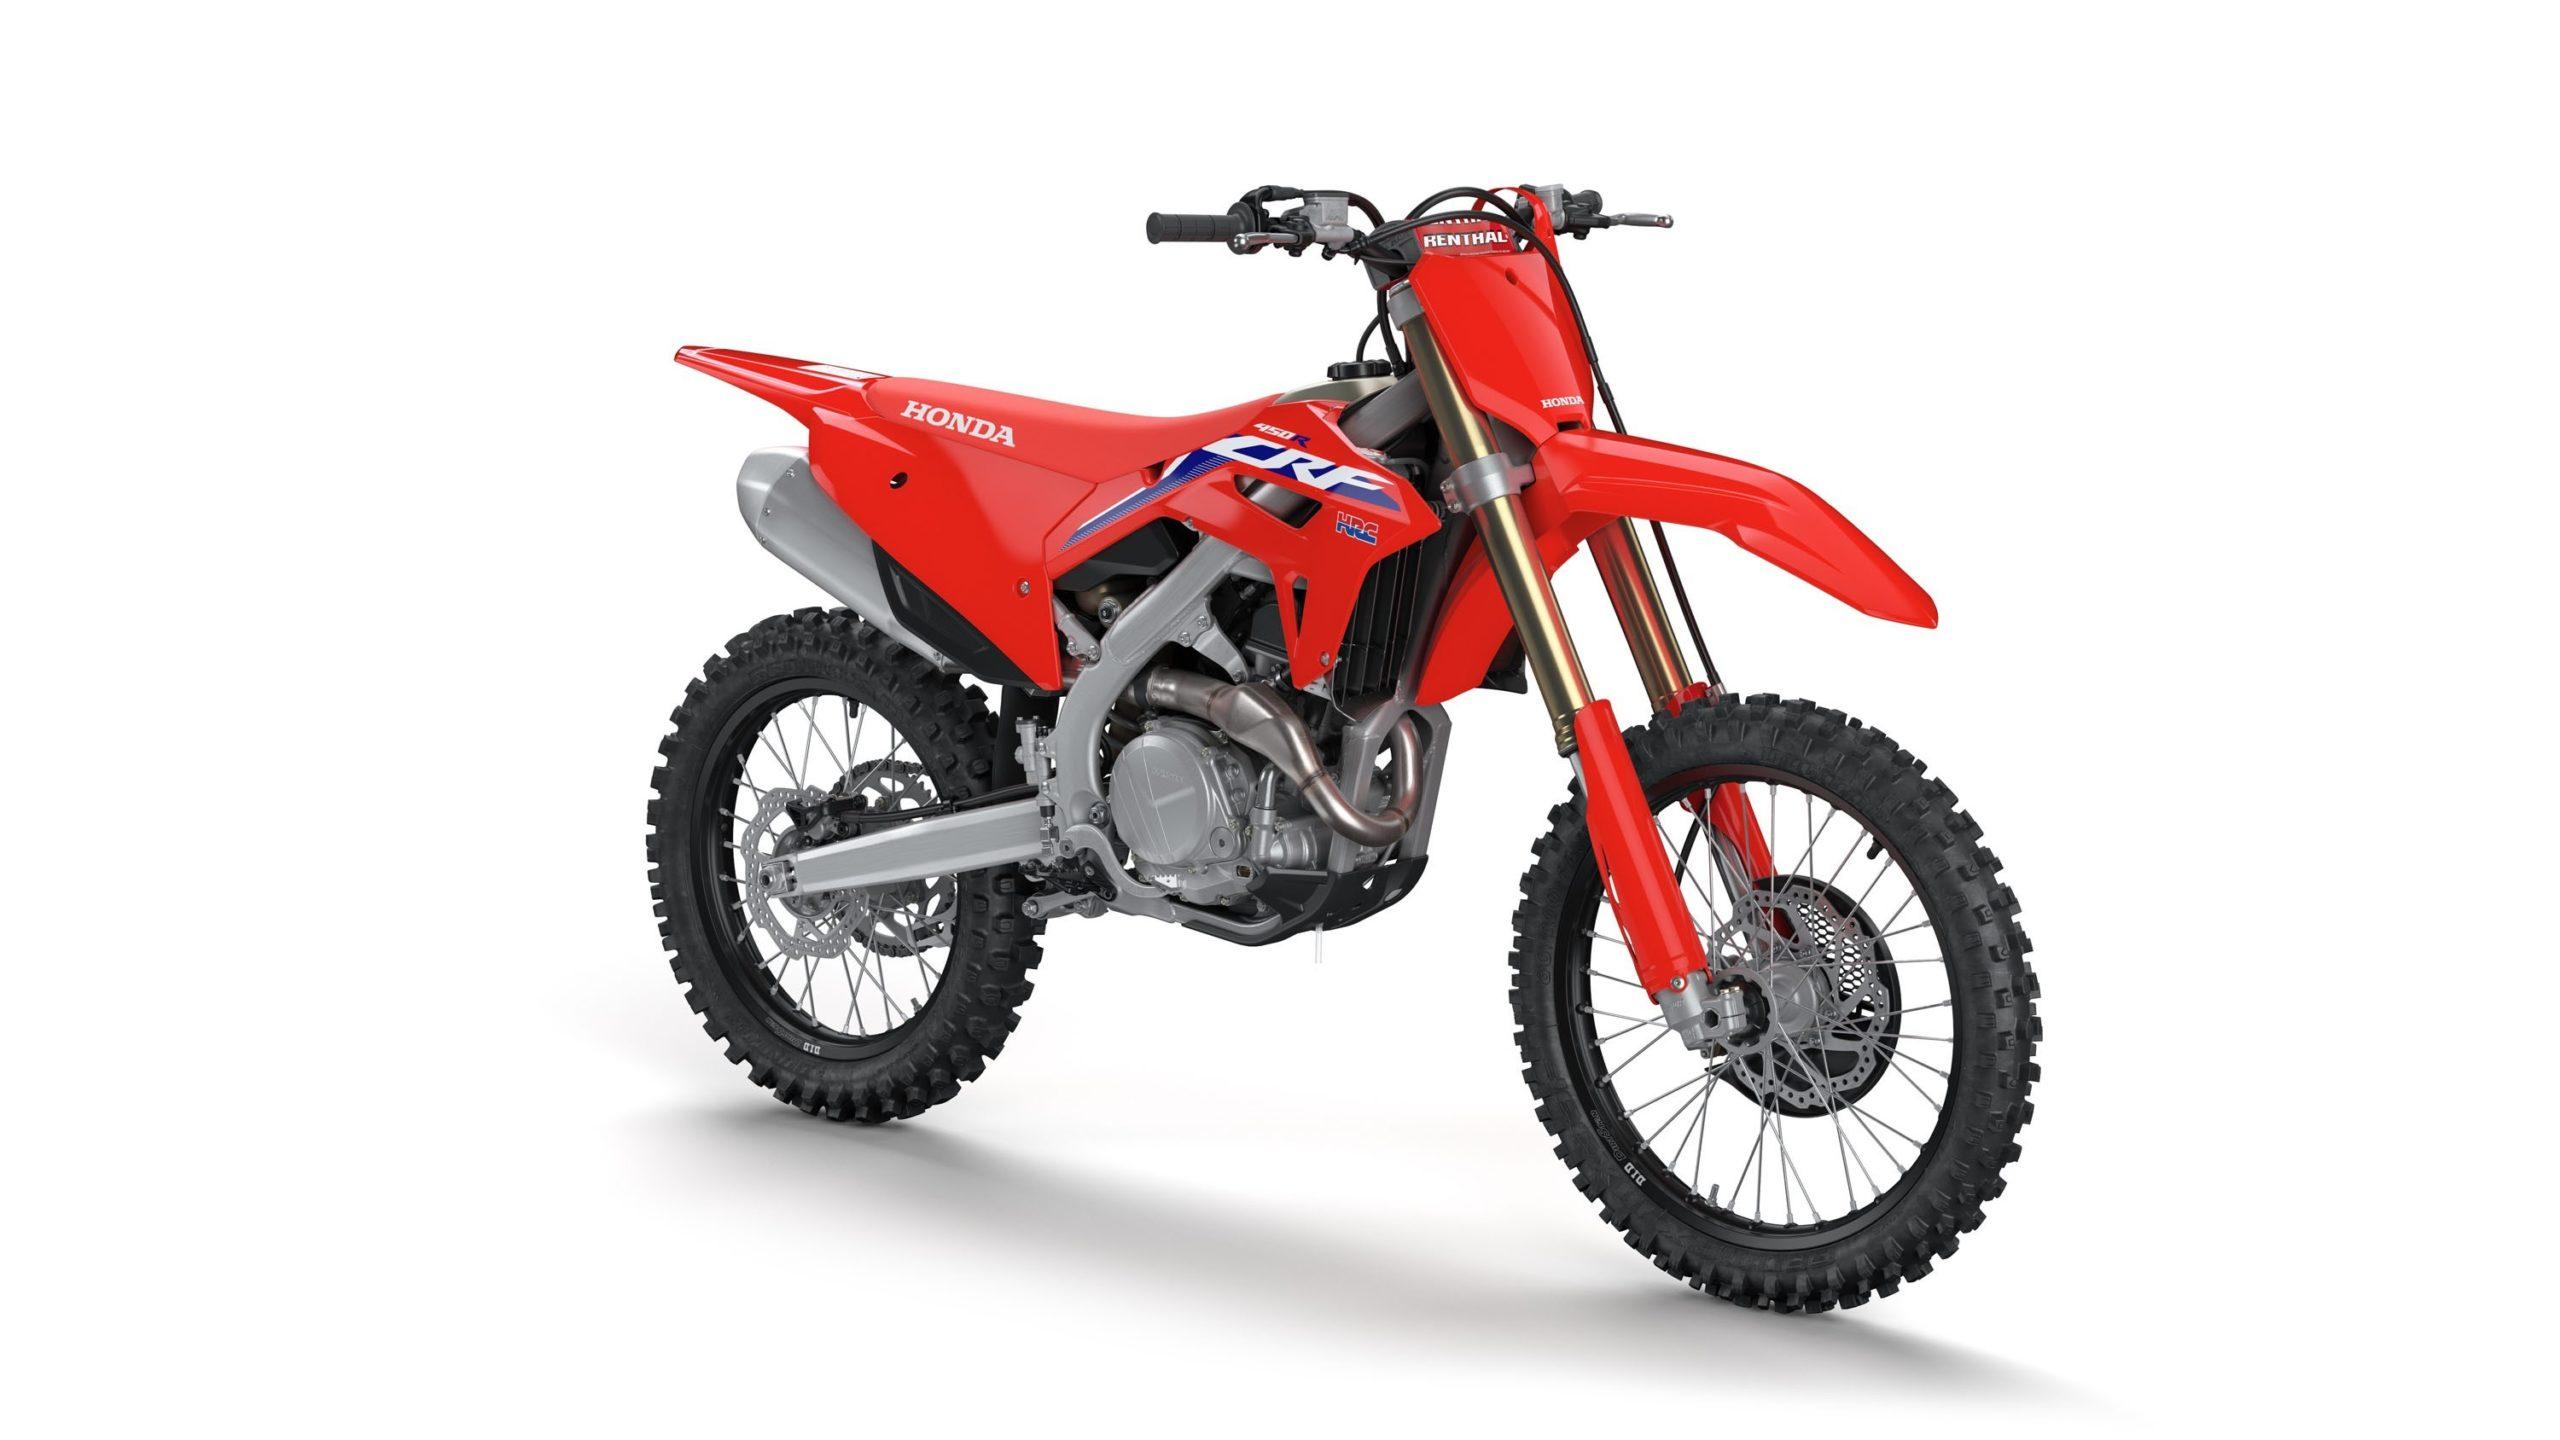 Recall de motos da Honda convoca a CRF 450R